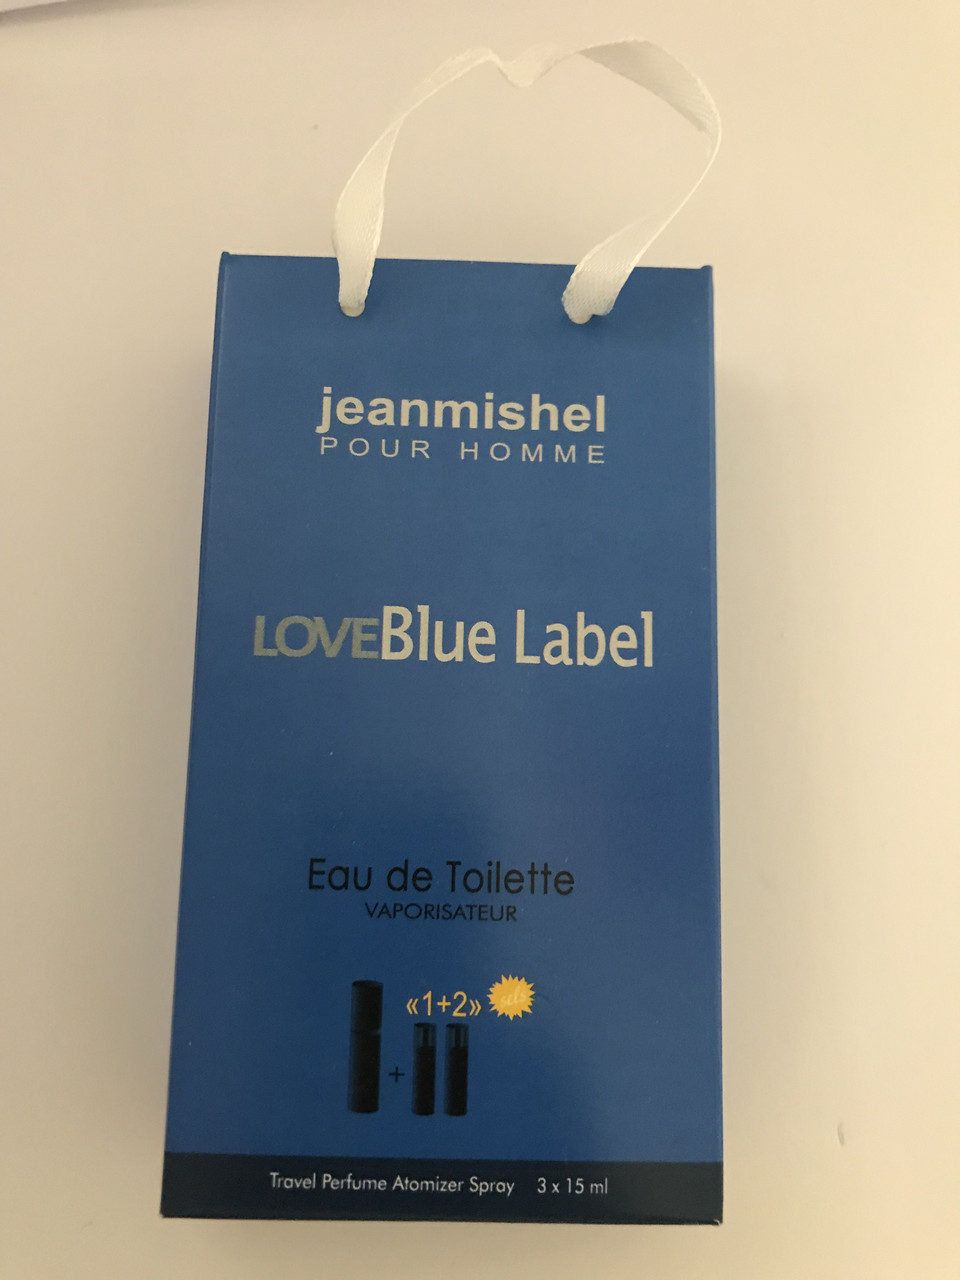 Мини парфюм в подарочной упаковке jeanmishel loveBlue Label 45мл